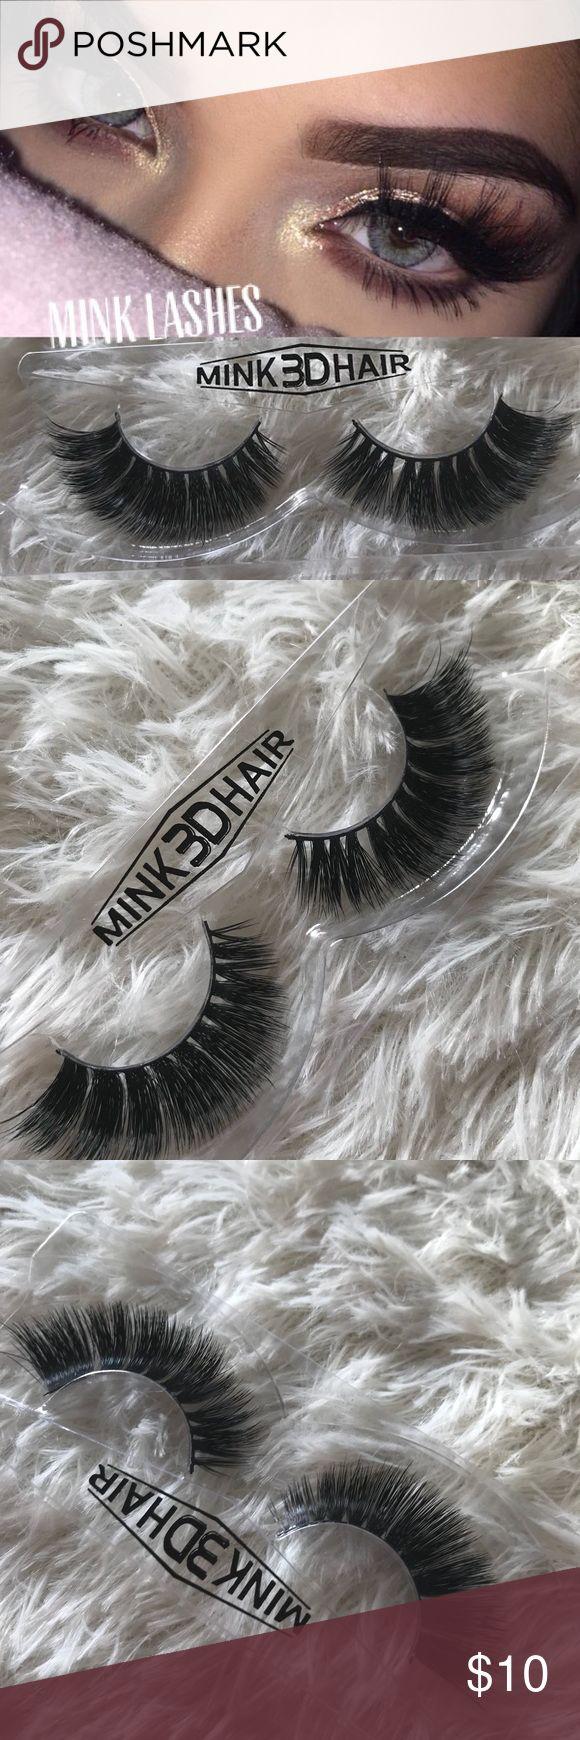 Premium mink lashes ⭐️1 Premium Mink Eyelashes    # tags, Iconic, mink, red cherry eyelashes, house of lashes, doll, kawaii, case, full, natural,  Koko, Ardell, wispies, Demi , makeup, mascara, eyelash applicator, Mykonos Mink , Lashes , wispy ,eyelash case, mink lashes  Ship within 24 hours ❣️ PRICE IS FIRM Makeup False Eyelashes